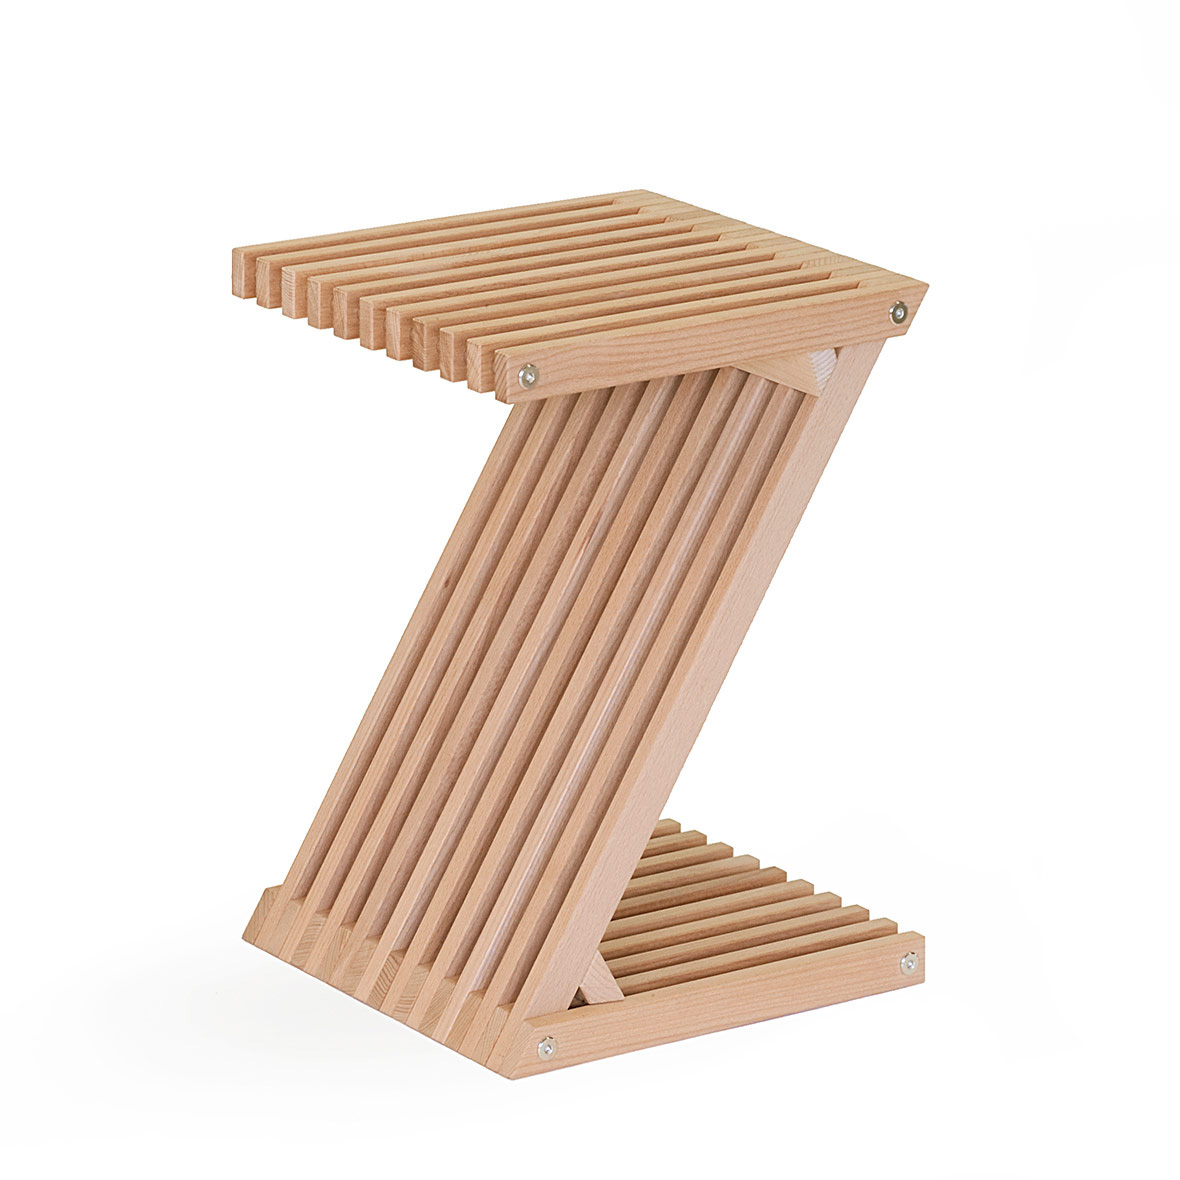 Holzmöbel Z-Hocker - Schweizer Massivholz